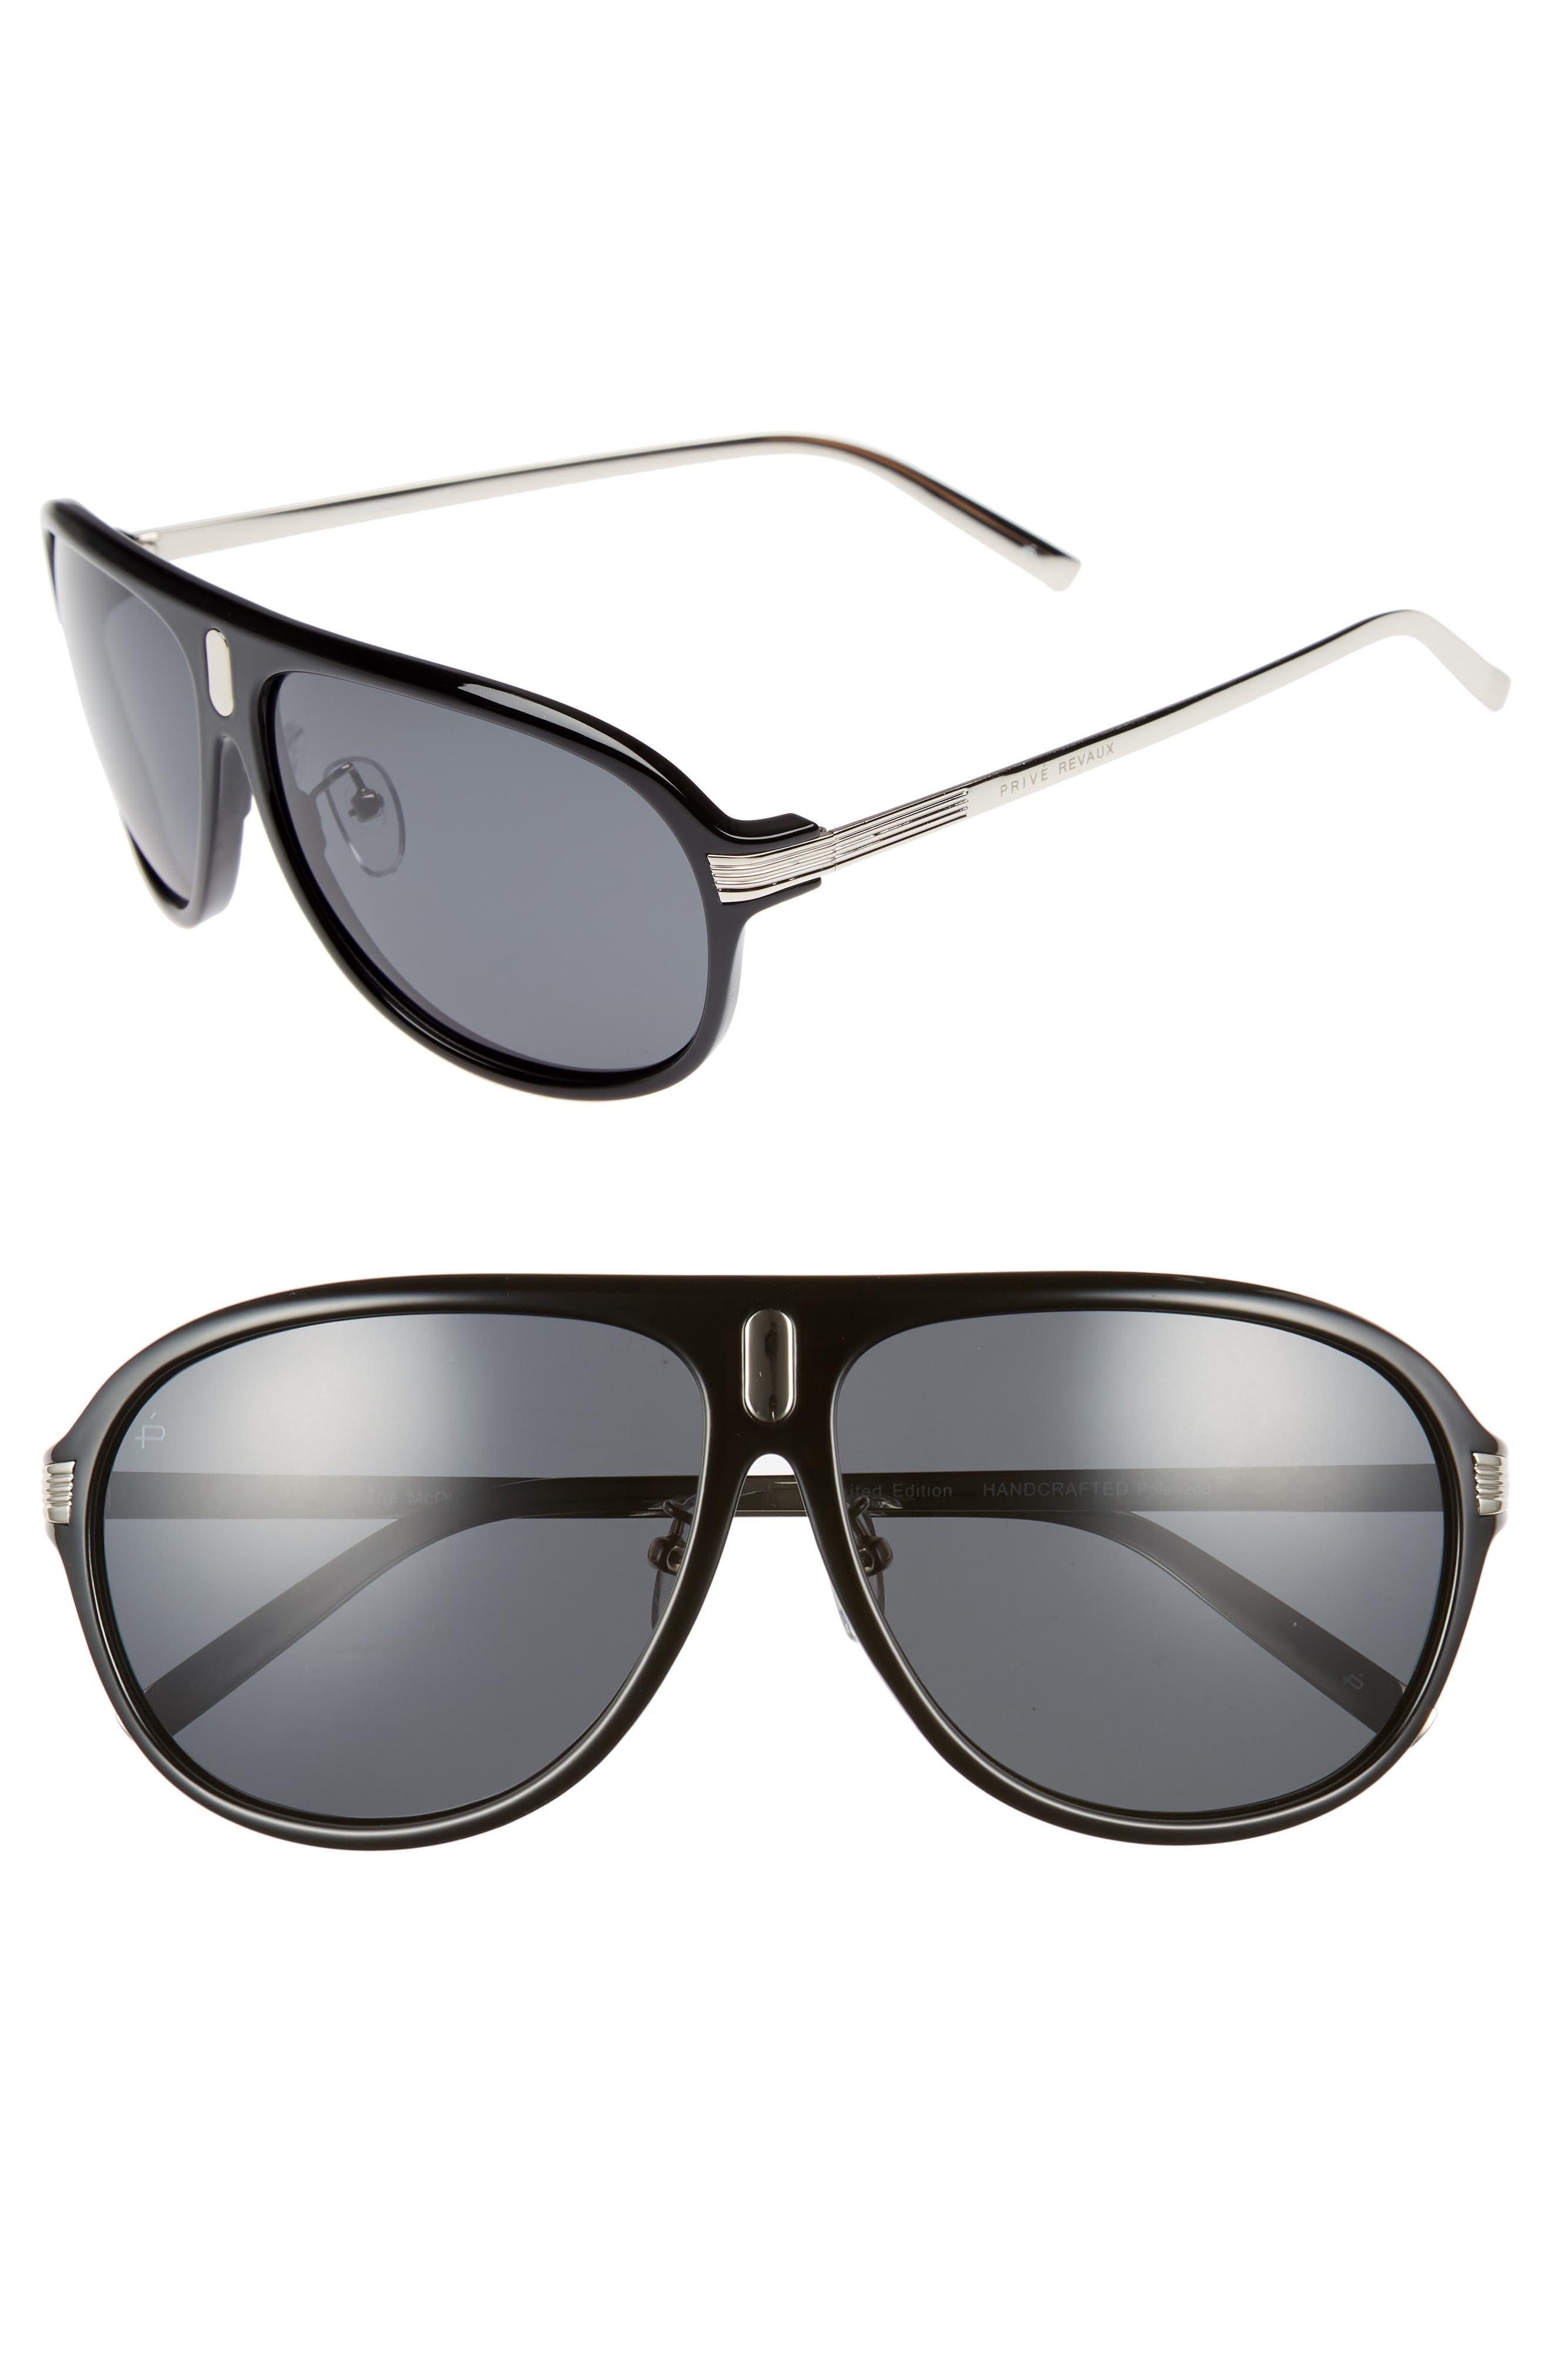 Privé Revaux The McQueen 62mm Polarized Aviator Sunglasses,                             Main thumbnail 1, color,                             001